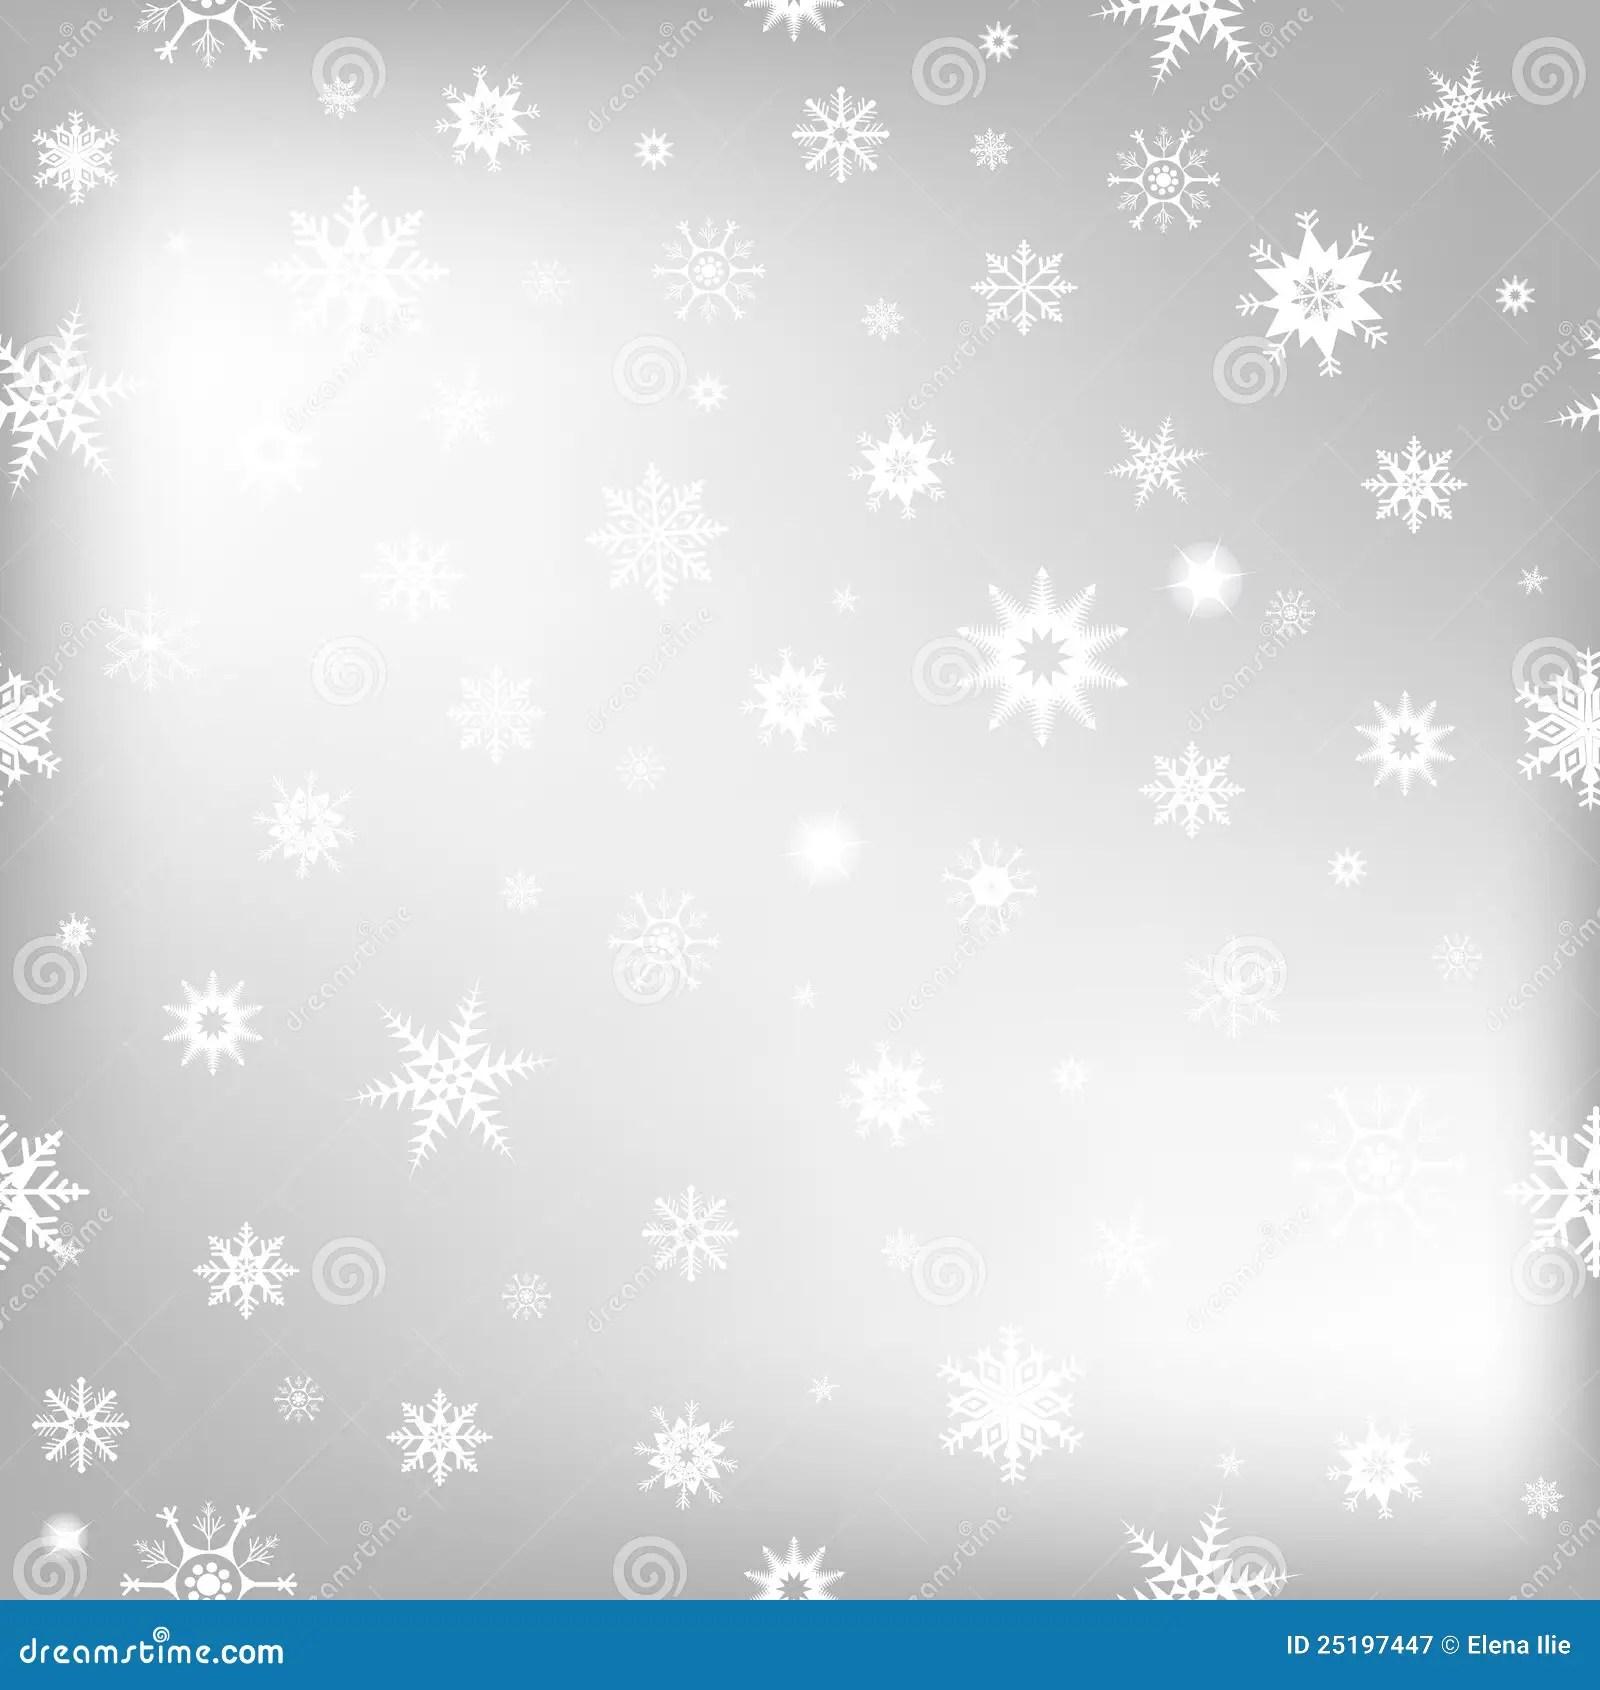 Christmas Background With White Snowflakes Stock